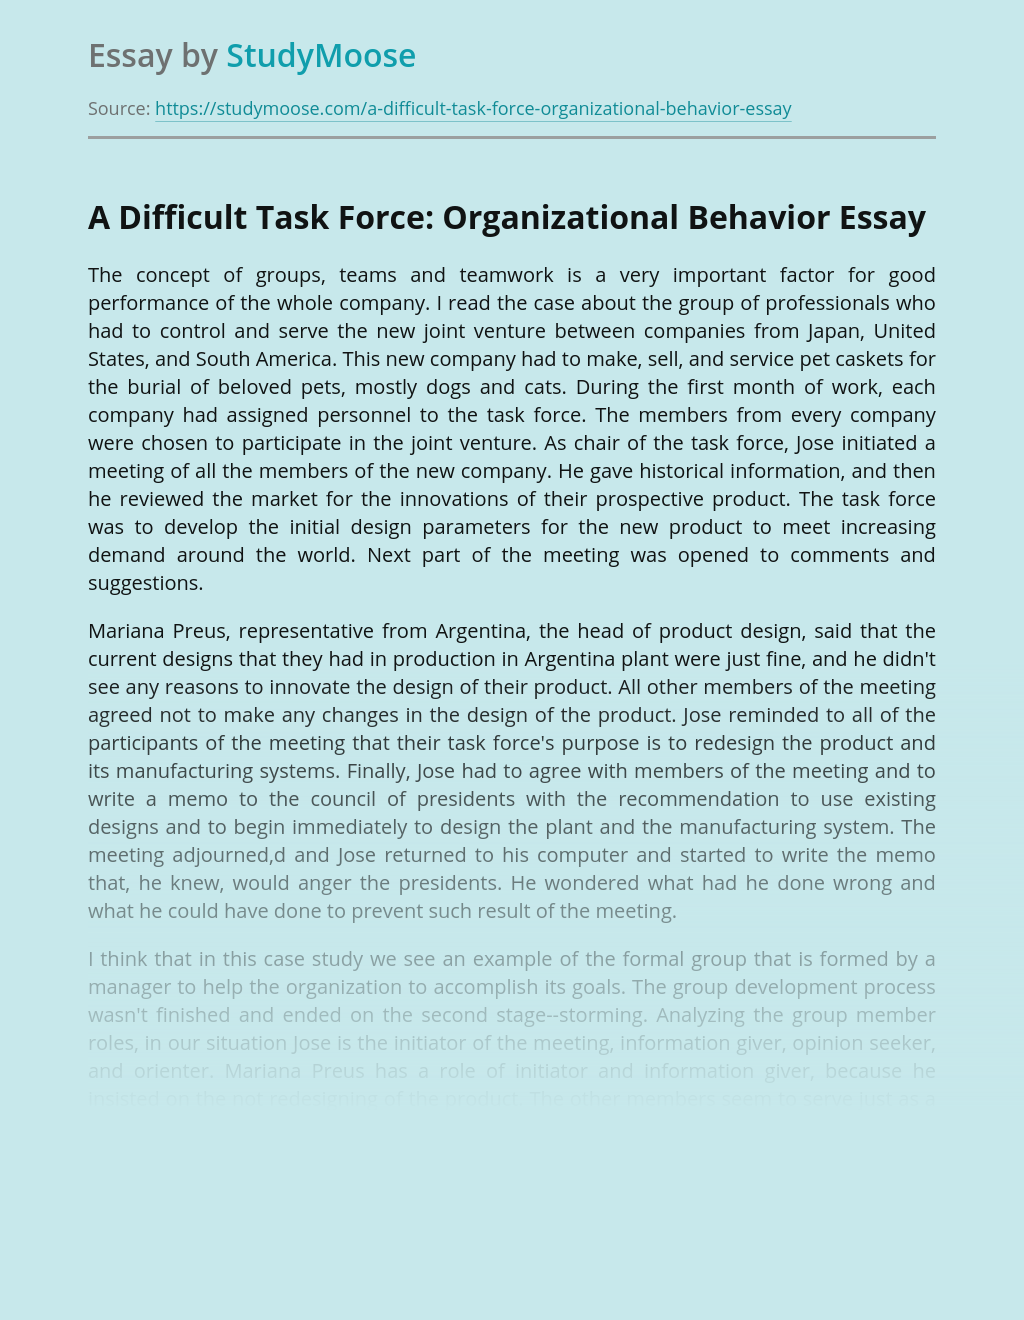 A Difficult Task Force: Organizational Behavior